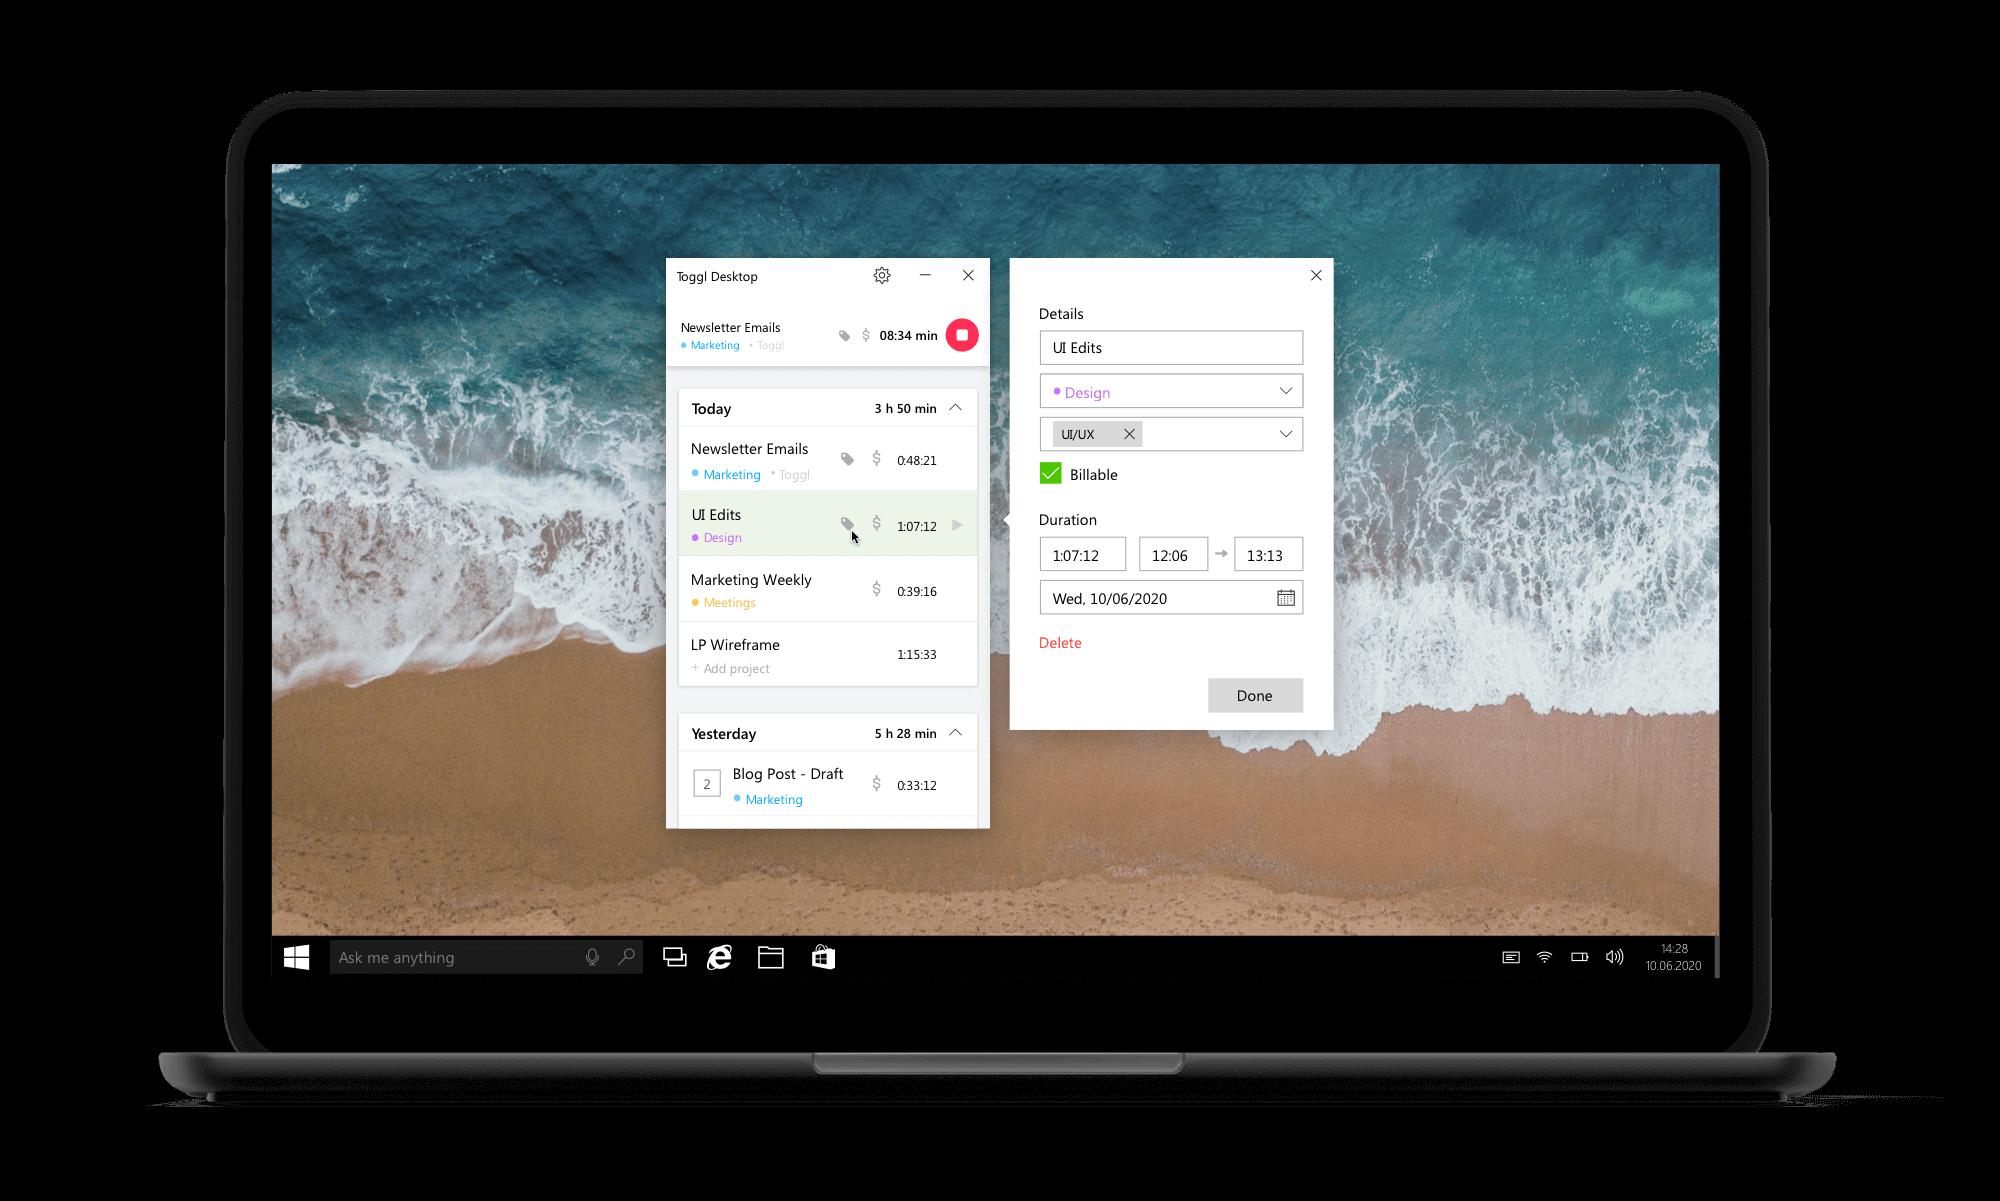 Free timer app for Windows